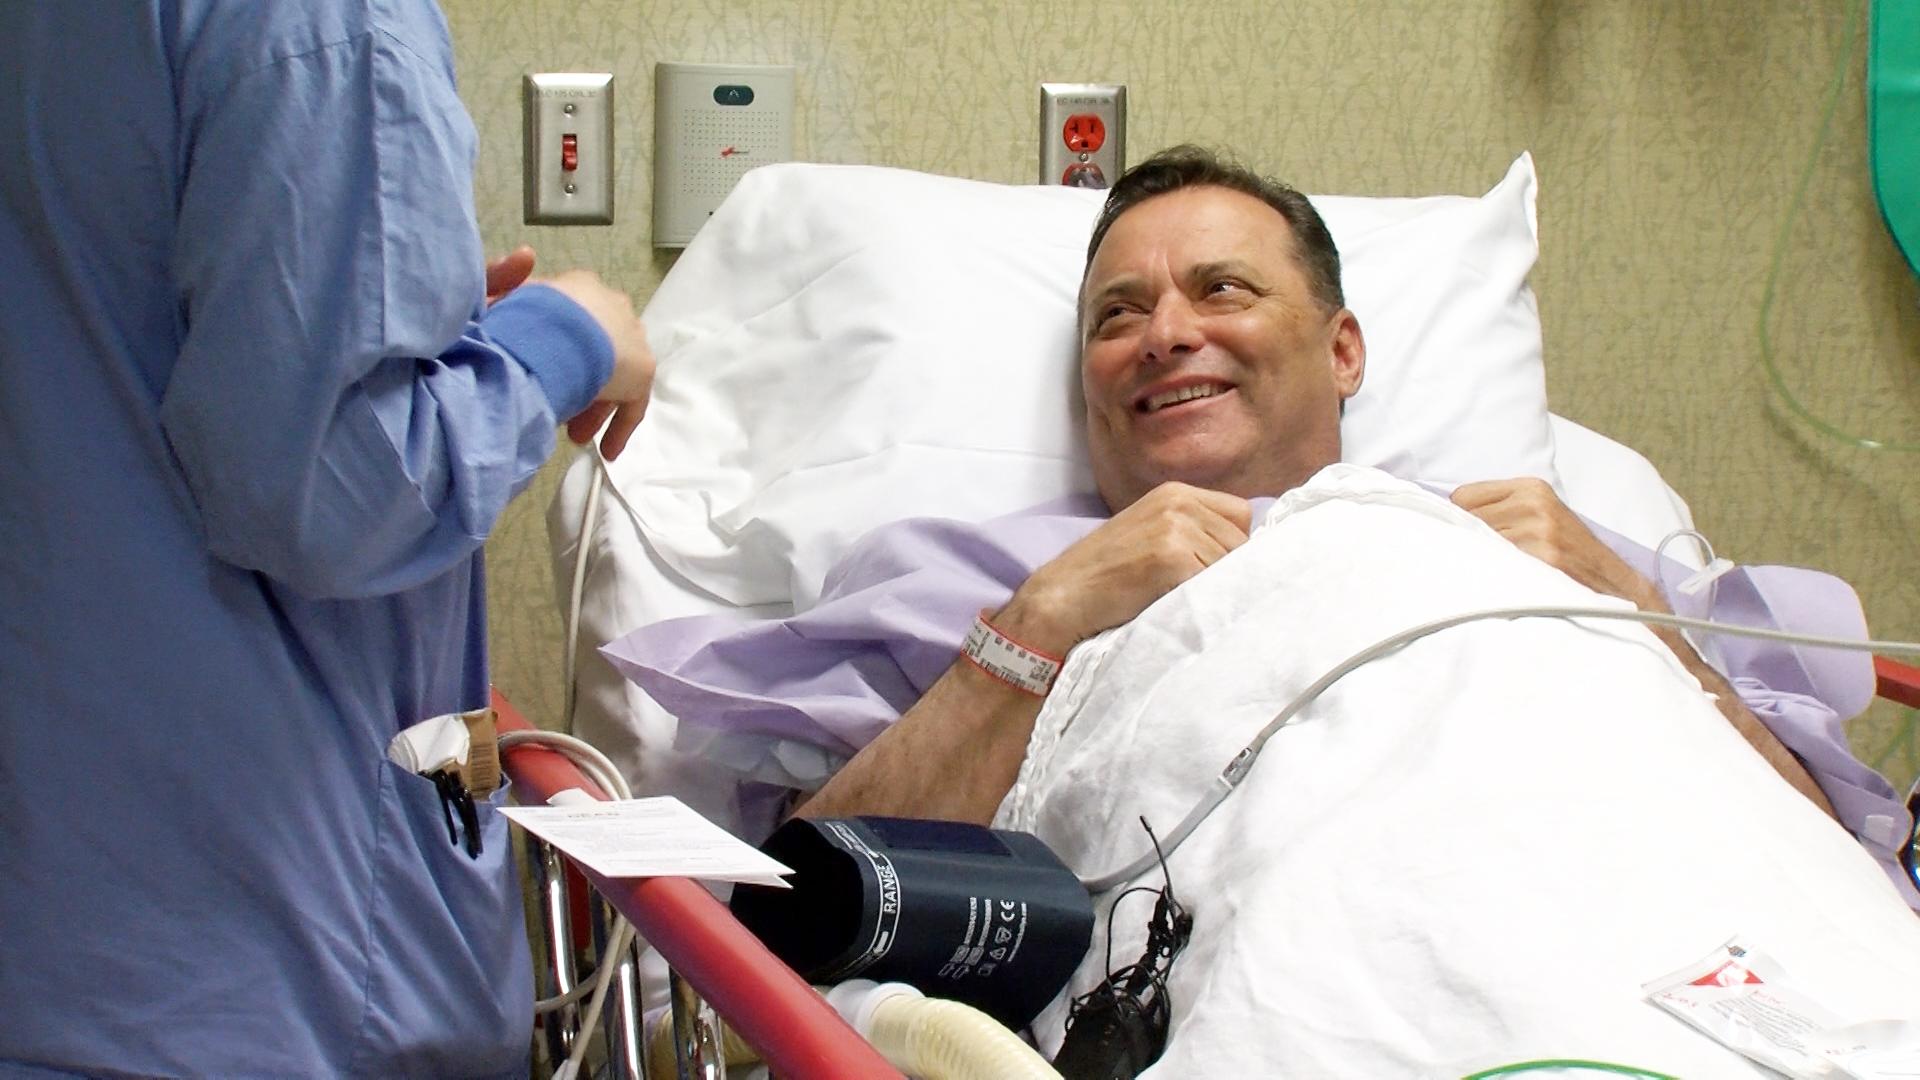 1524678756-billy-gillispie(pre-surgery)